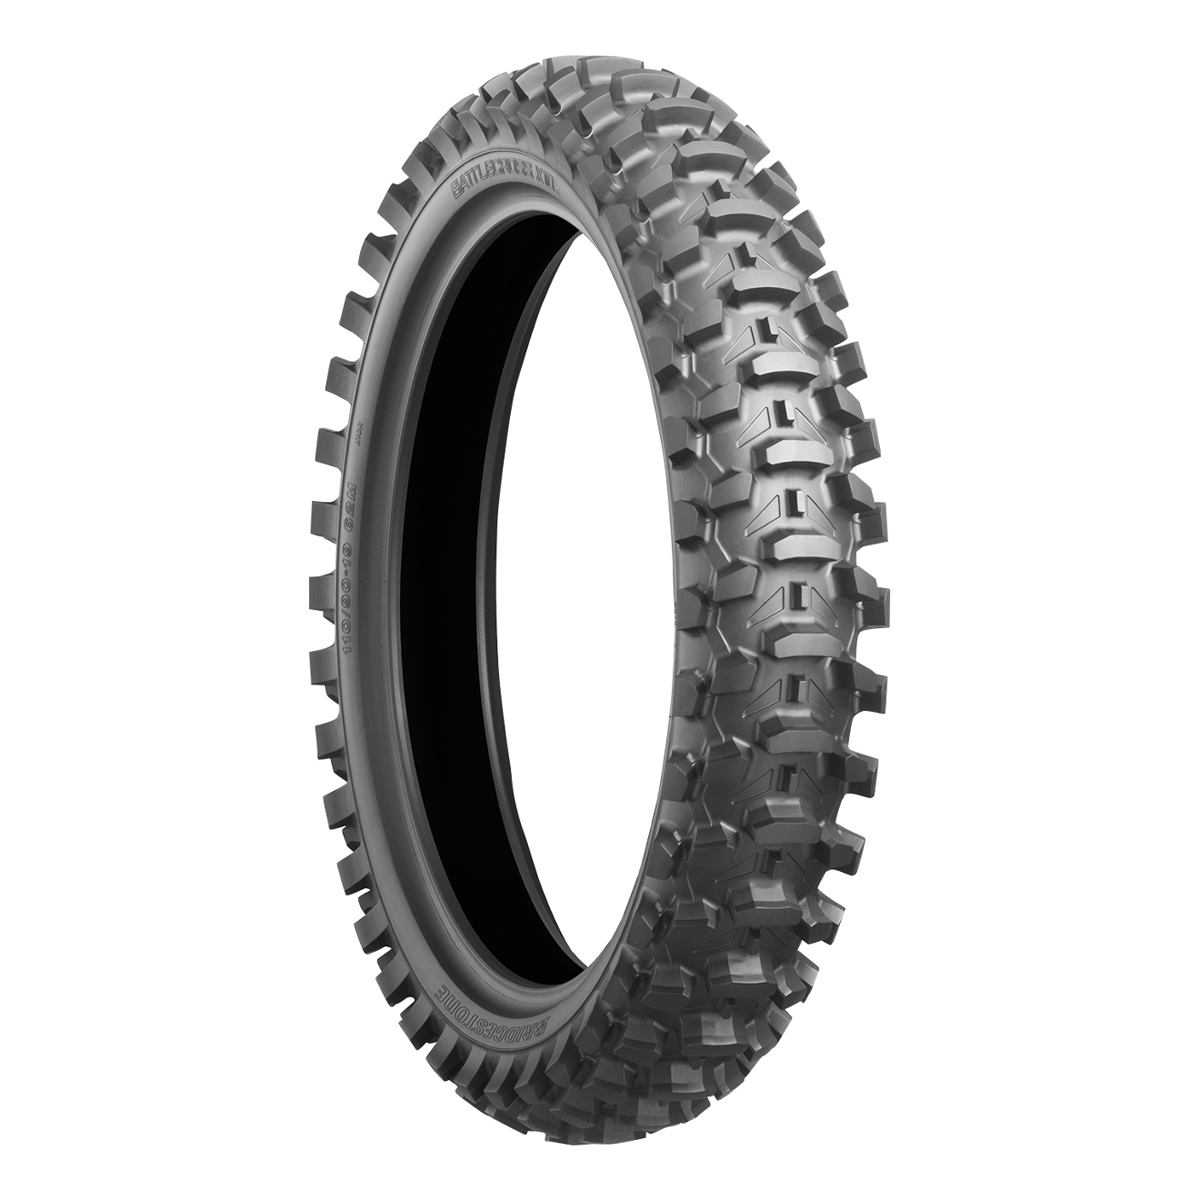 Bridgestone Battlecross X10R 110/90-19 Tire